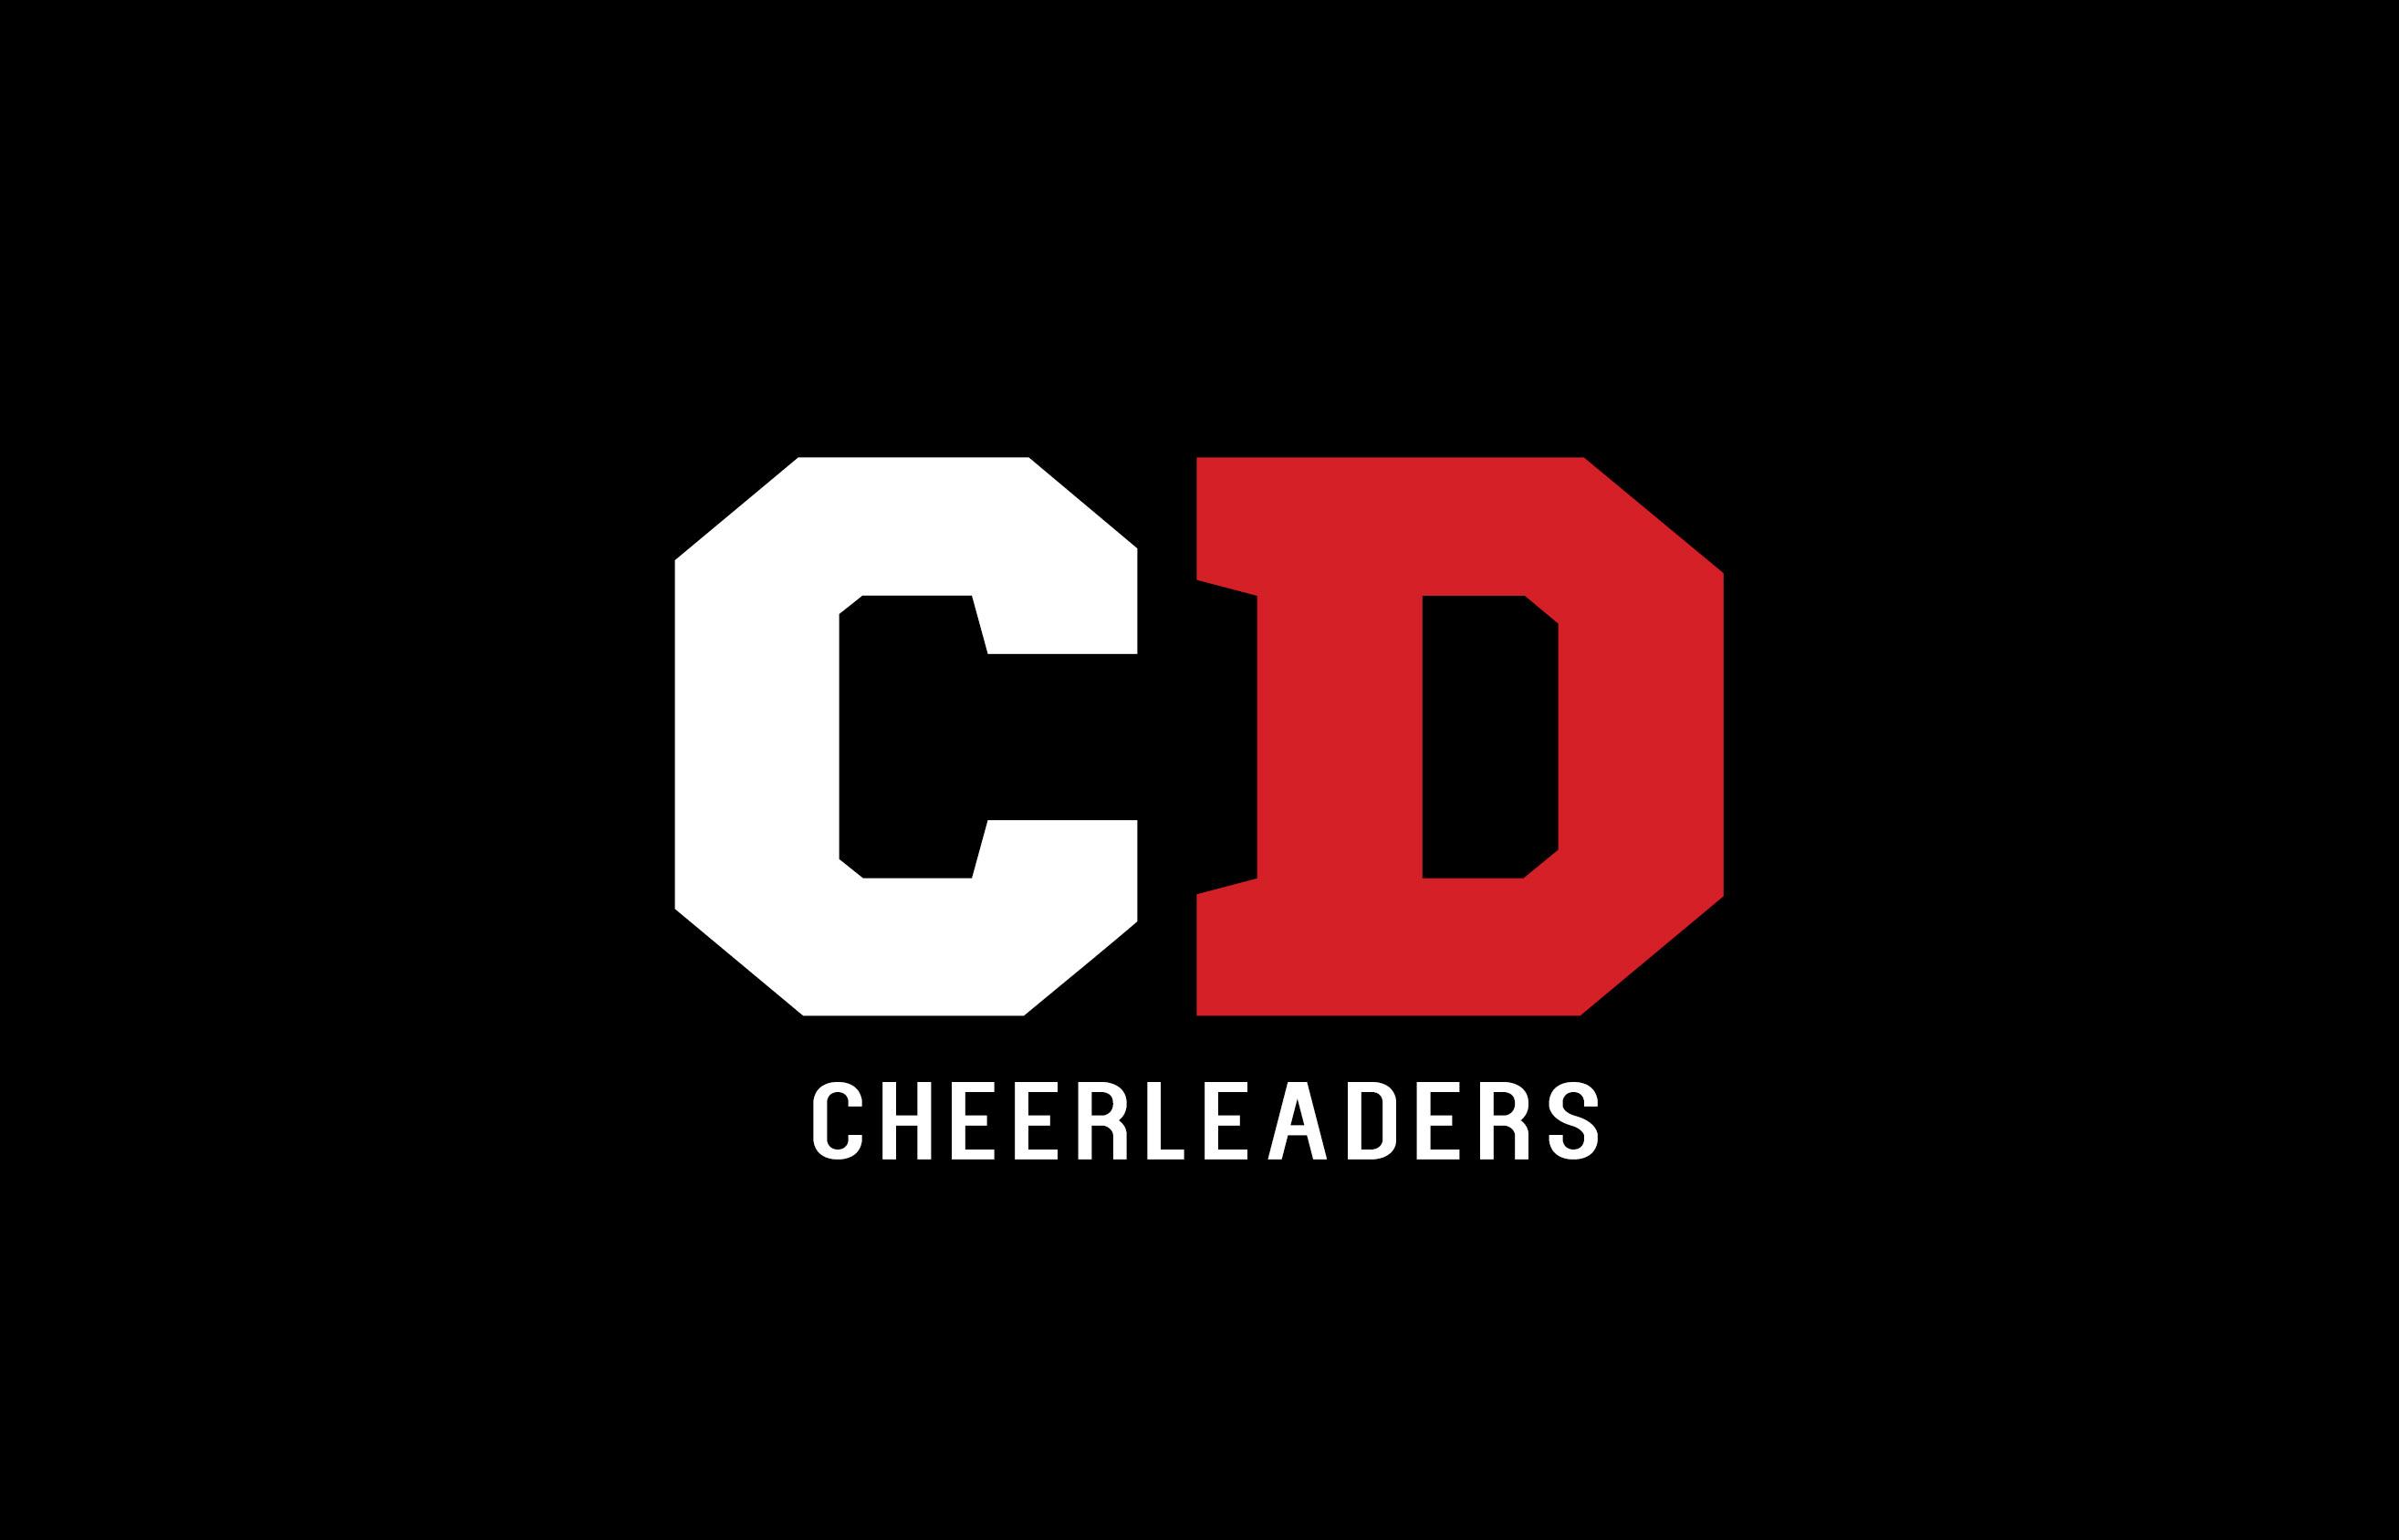 Coventry Dynamite Cheerleaders's logo